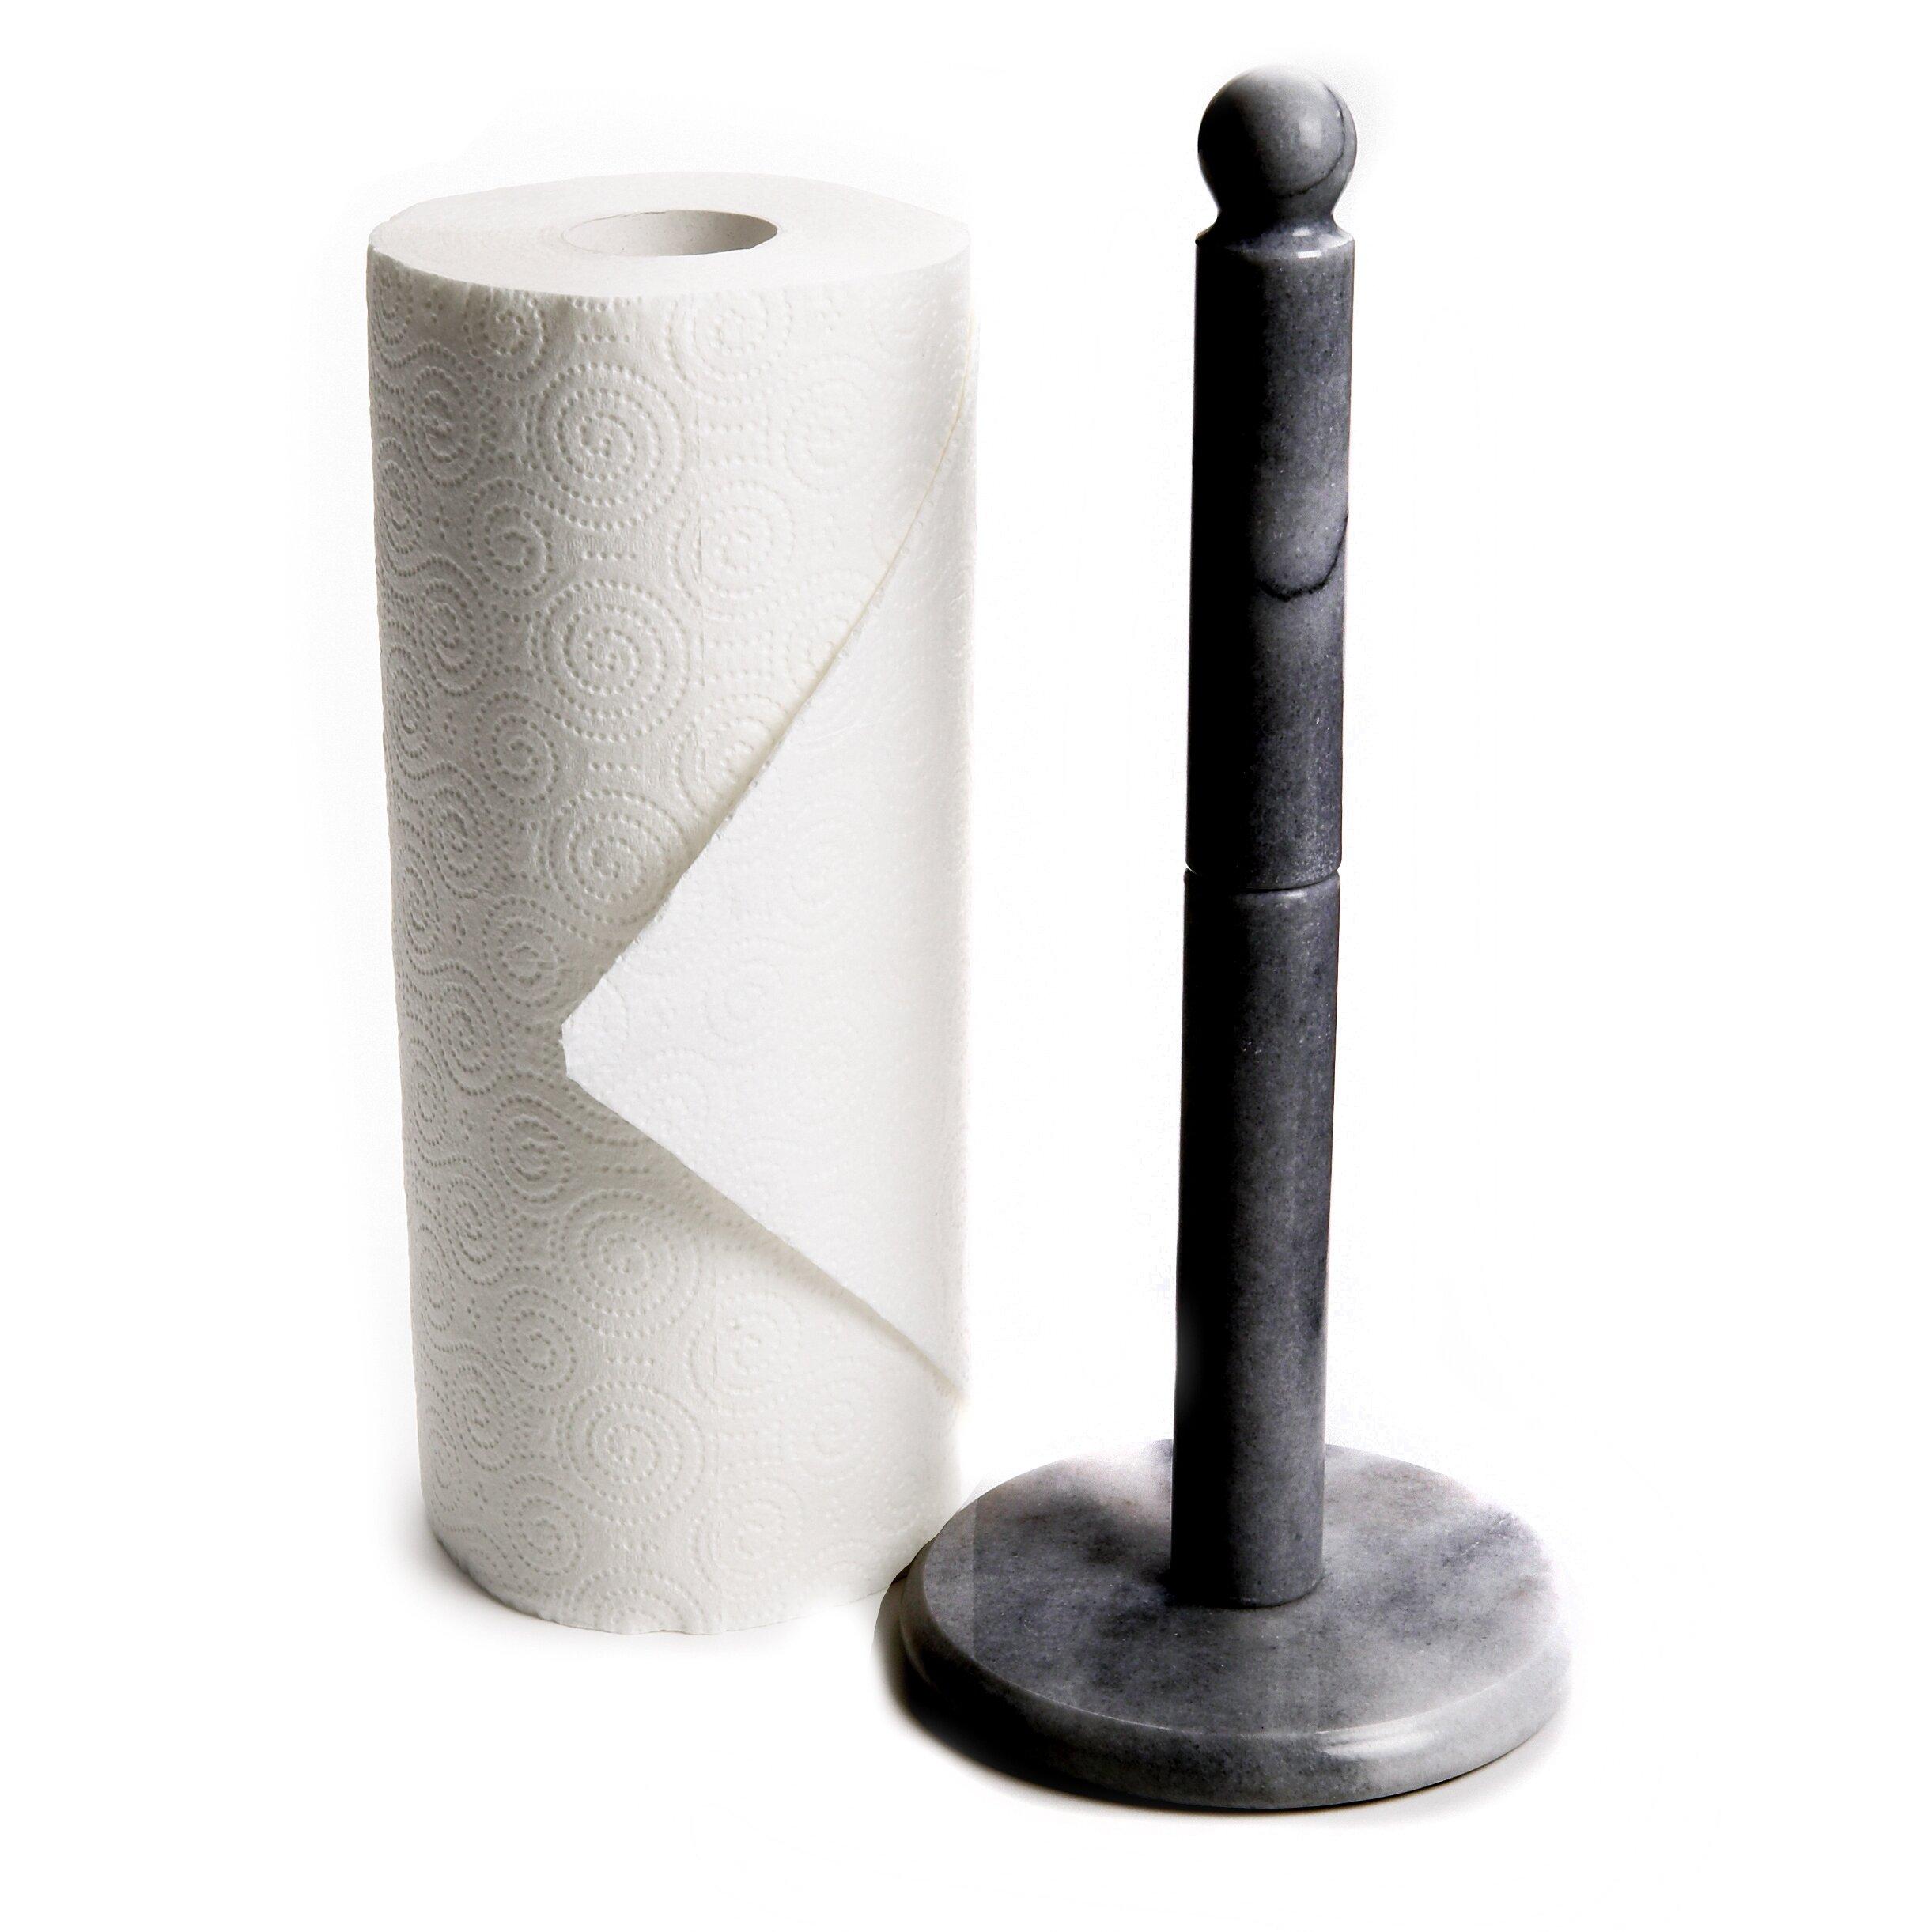 Fox Run Craftsmen Marble Paper Towel Holder in Black  : Marble2BPaper2BTowel2BHolder2Bin2BBlack from www.wayfair.com size 2443 x 2443 jpeg 487kB